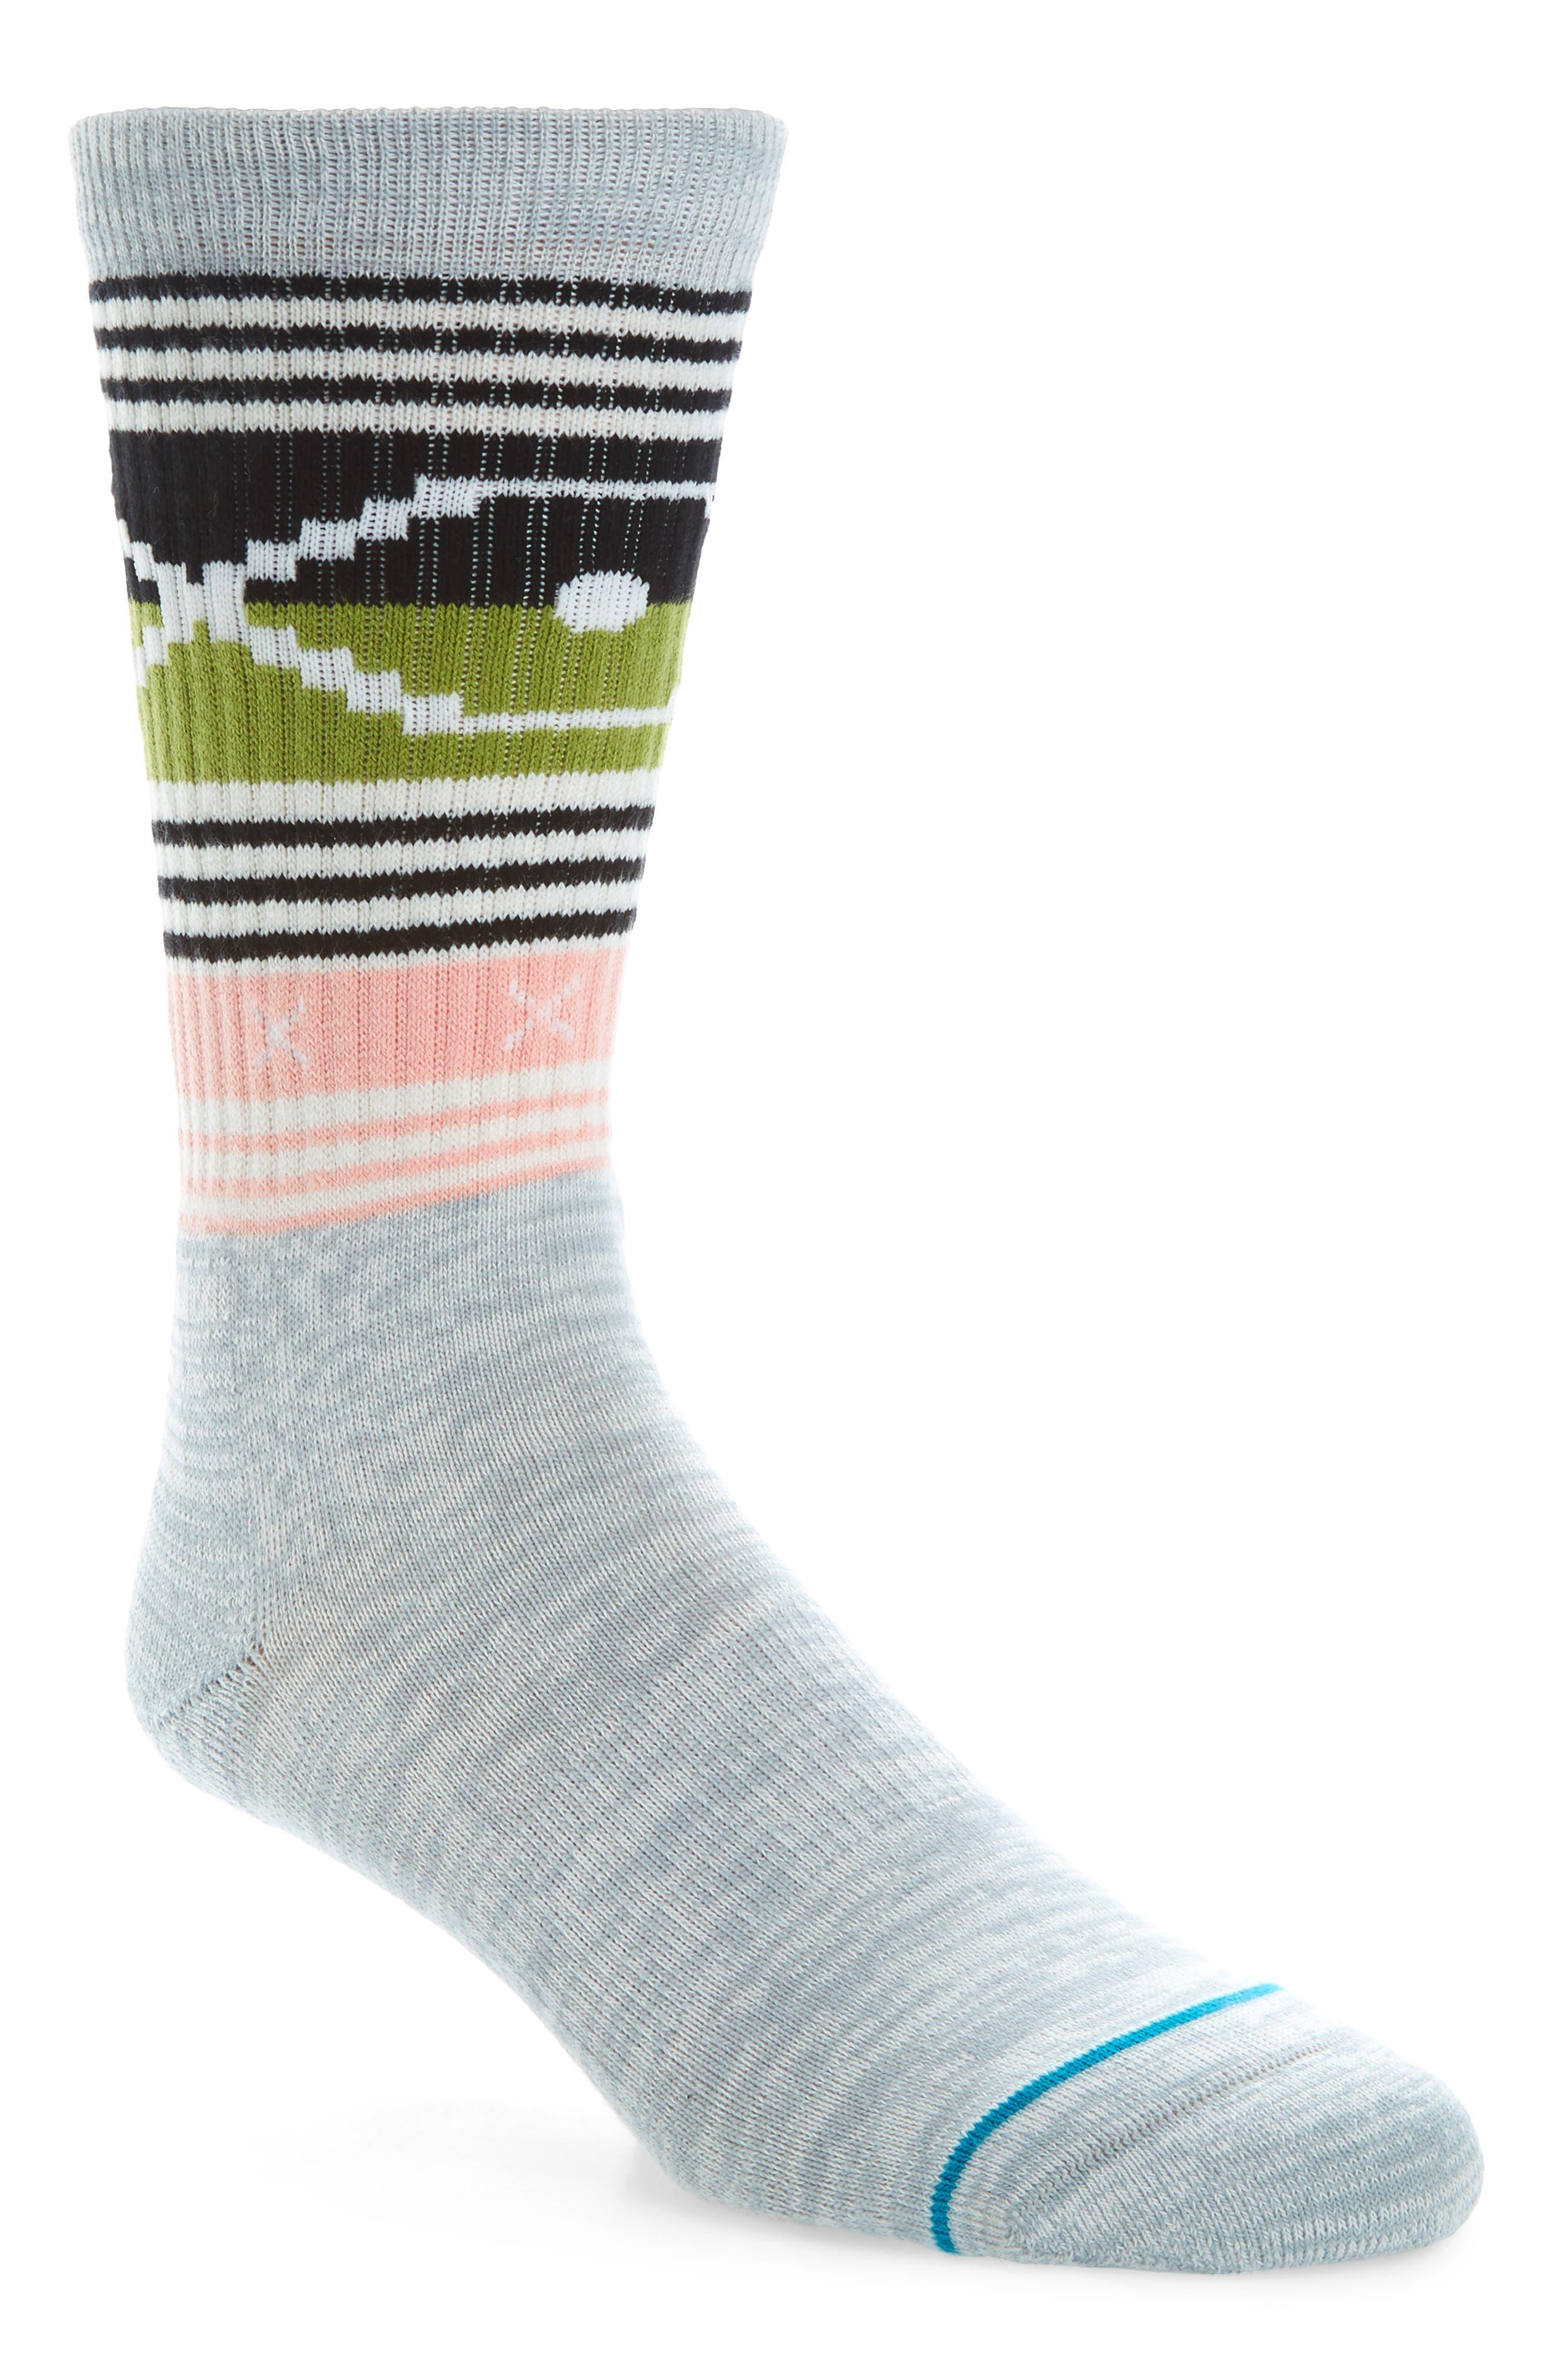 Stance Harries Crew Socks